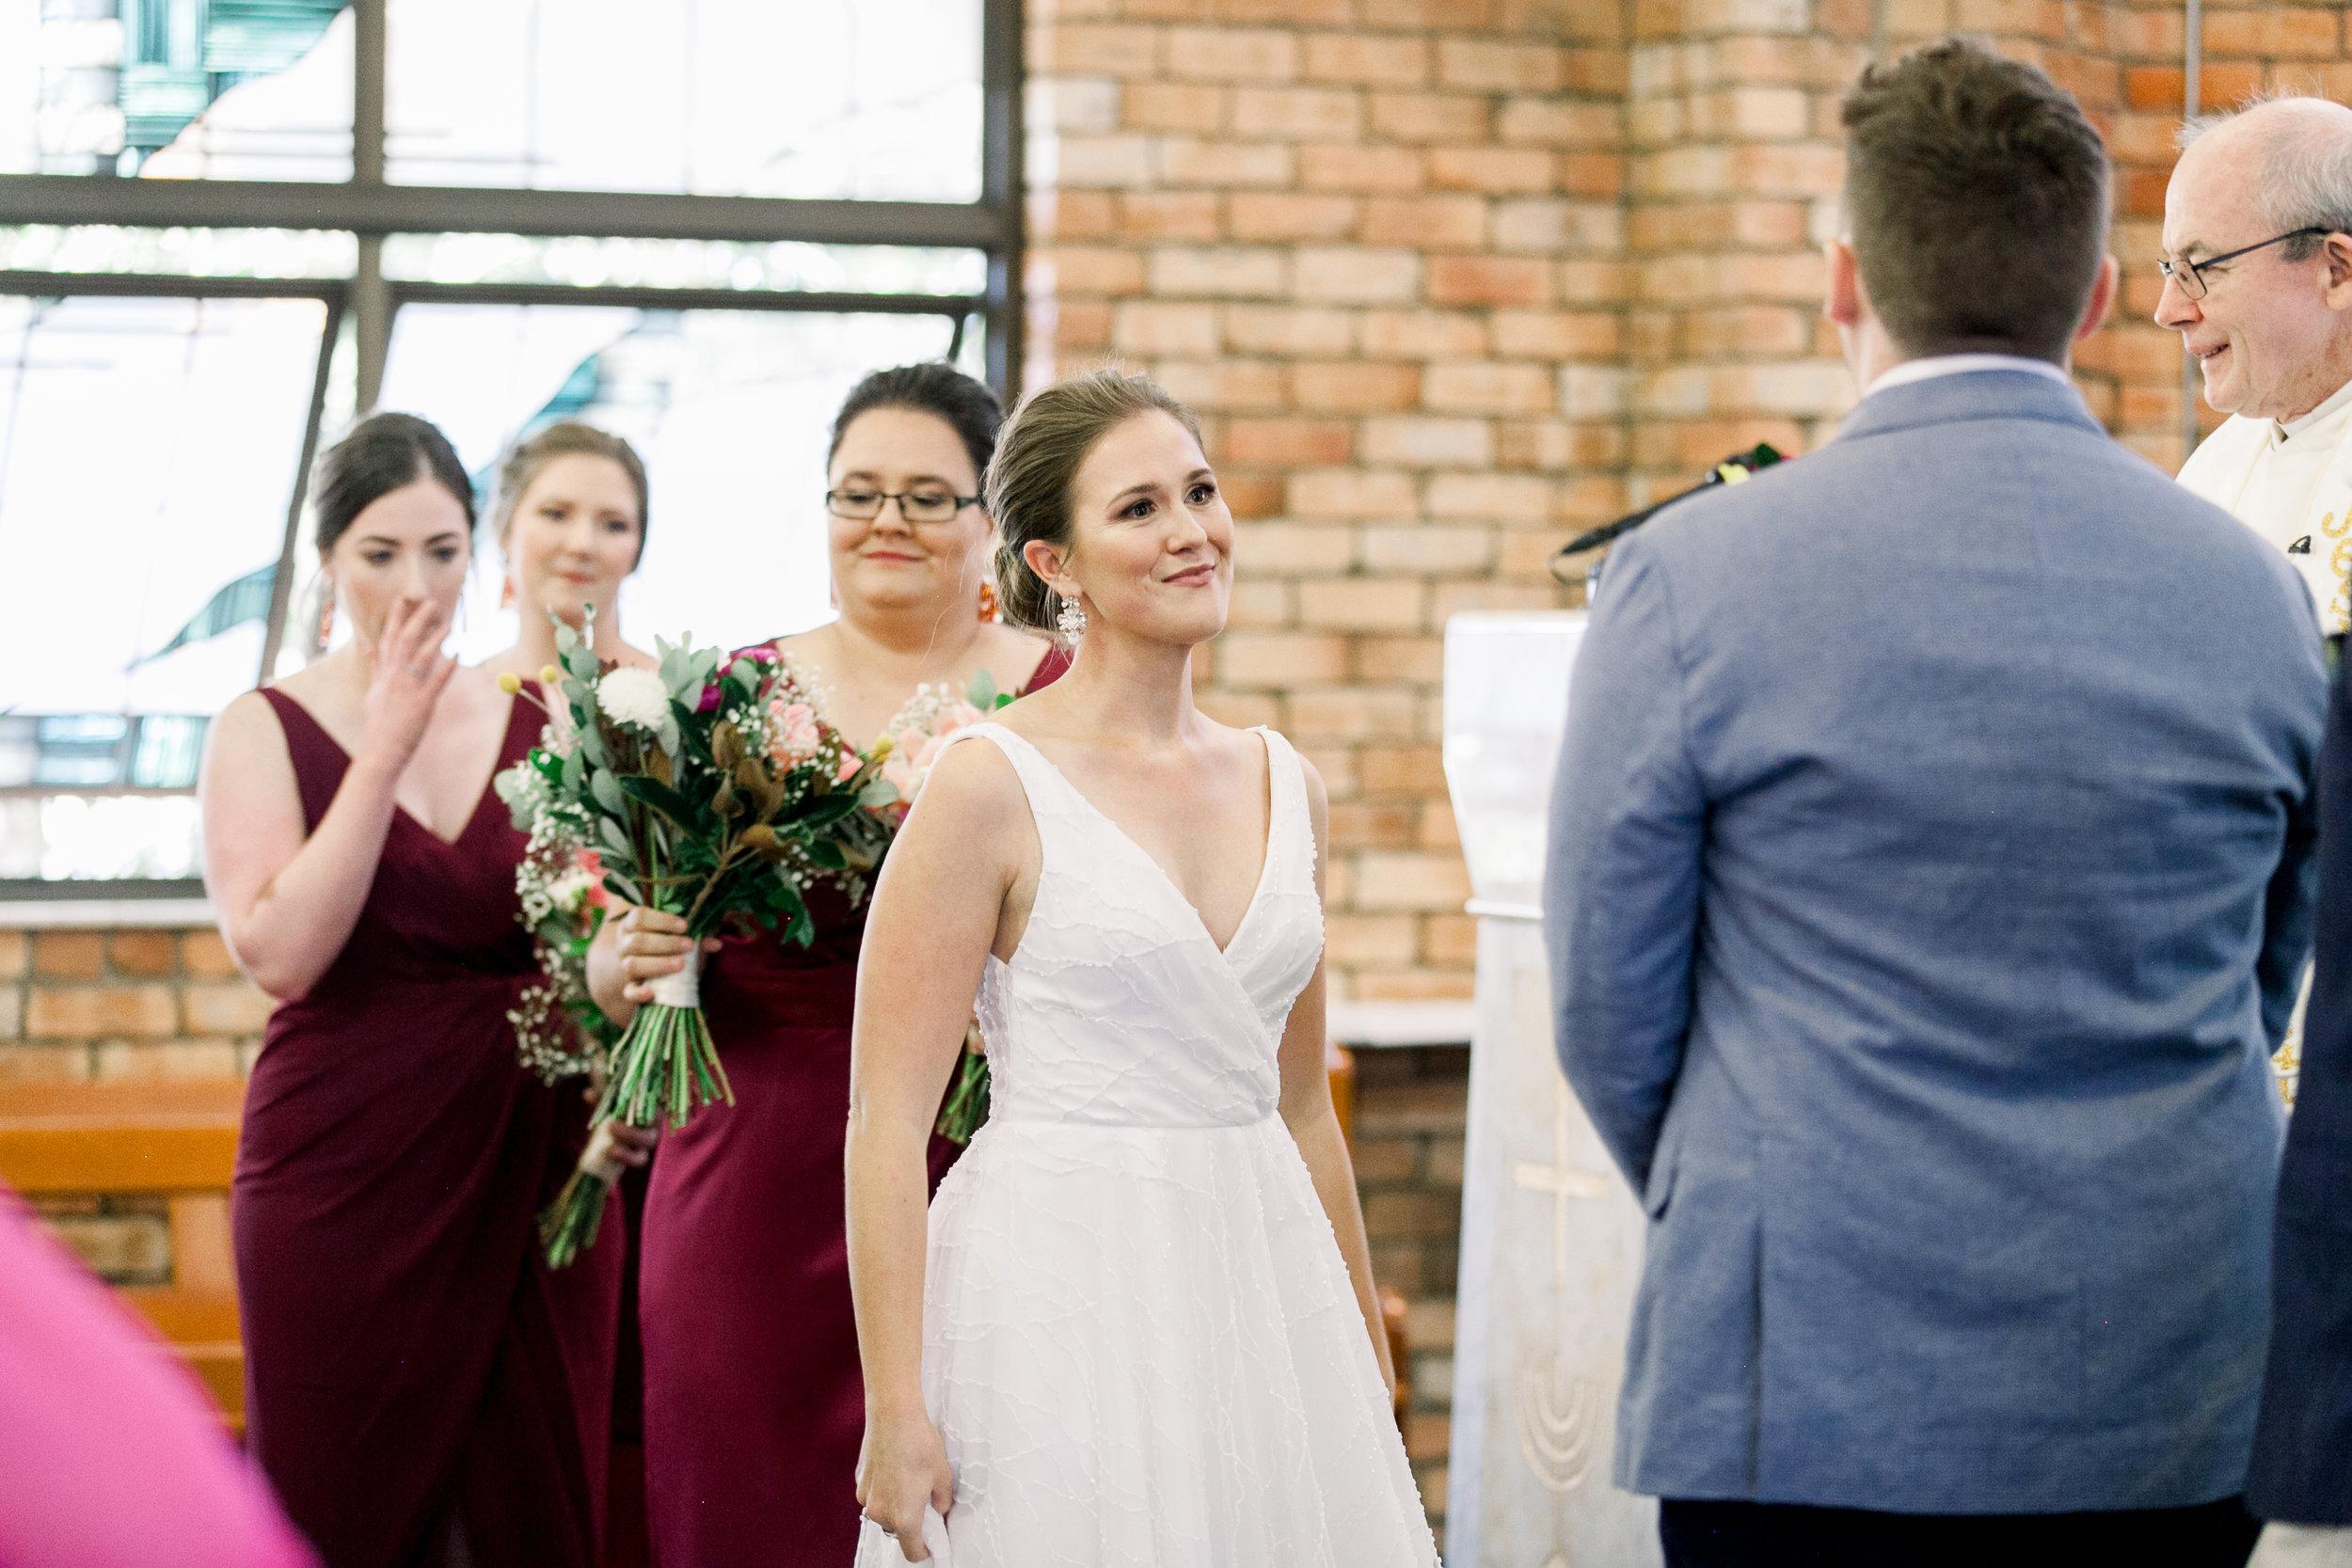 refinery-wedding-brisbane-city-wedding-photographer-45.jpg